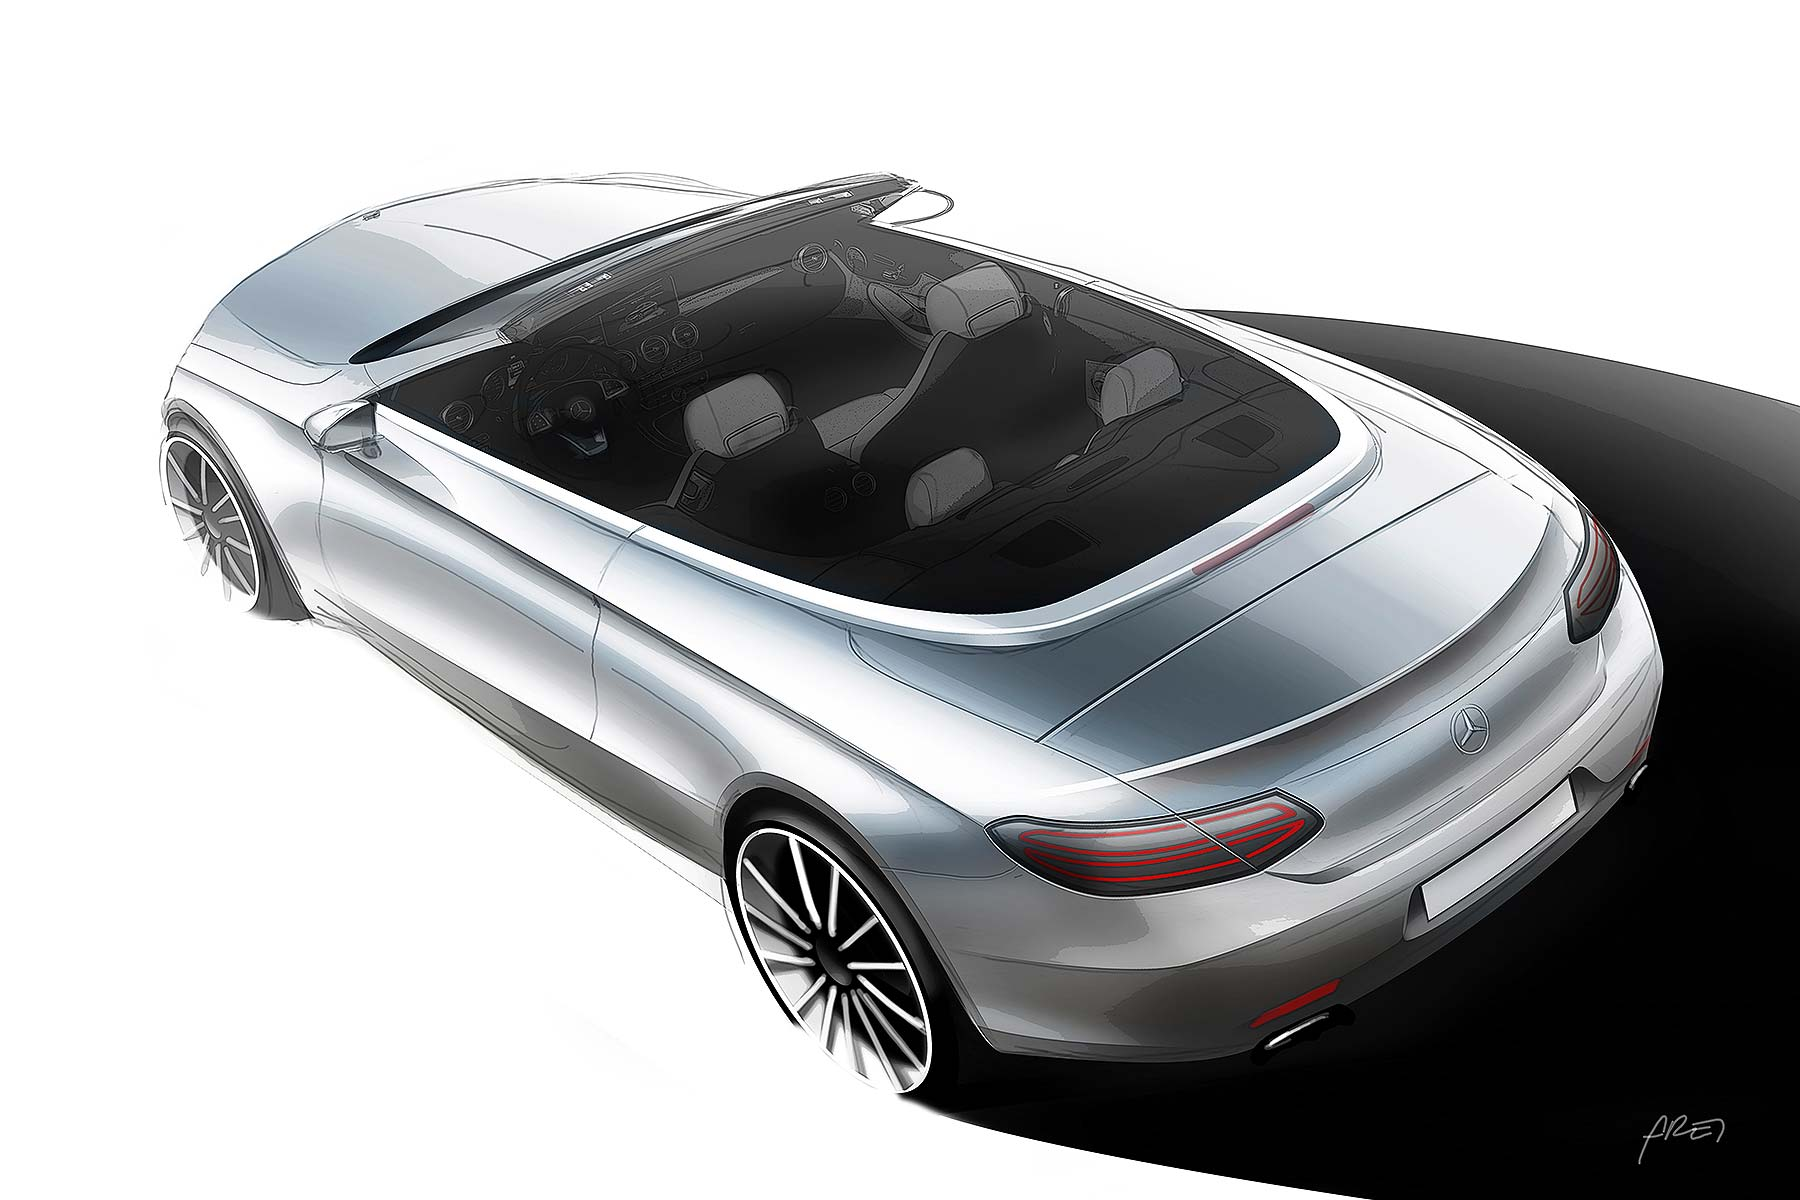 Mercedes-Benz C-Class Cabriolet design sketch